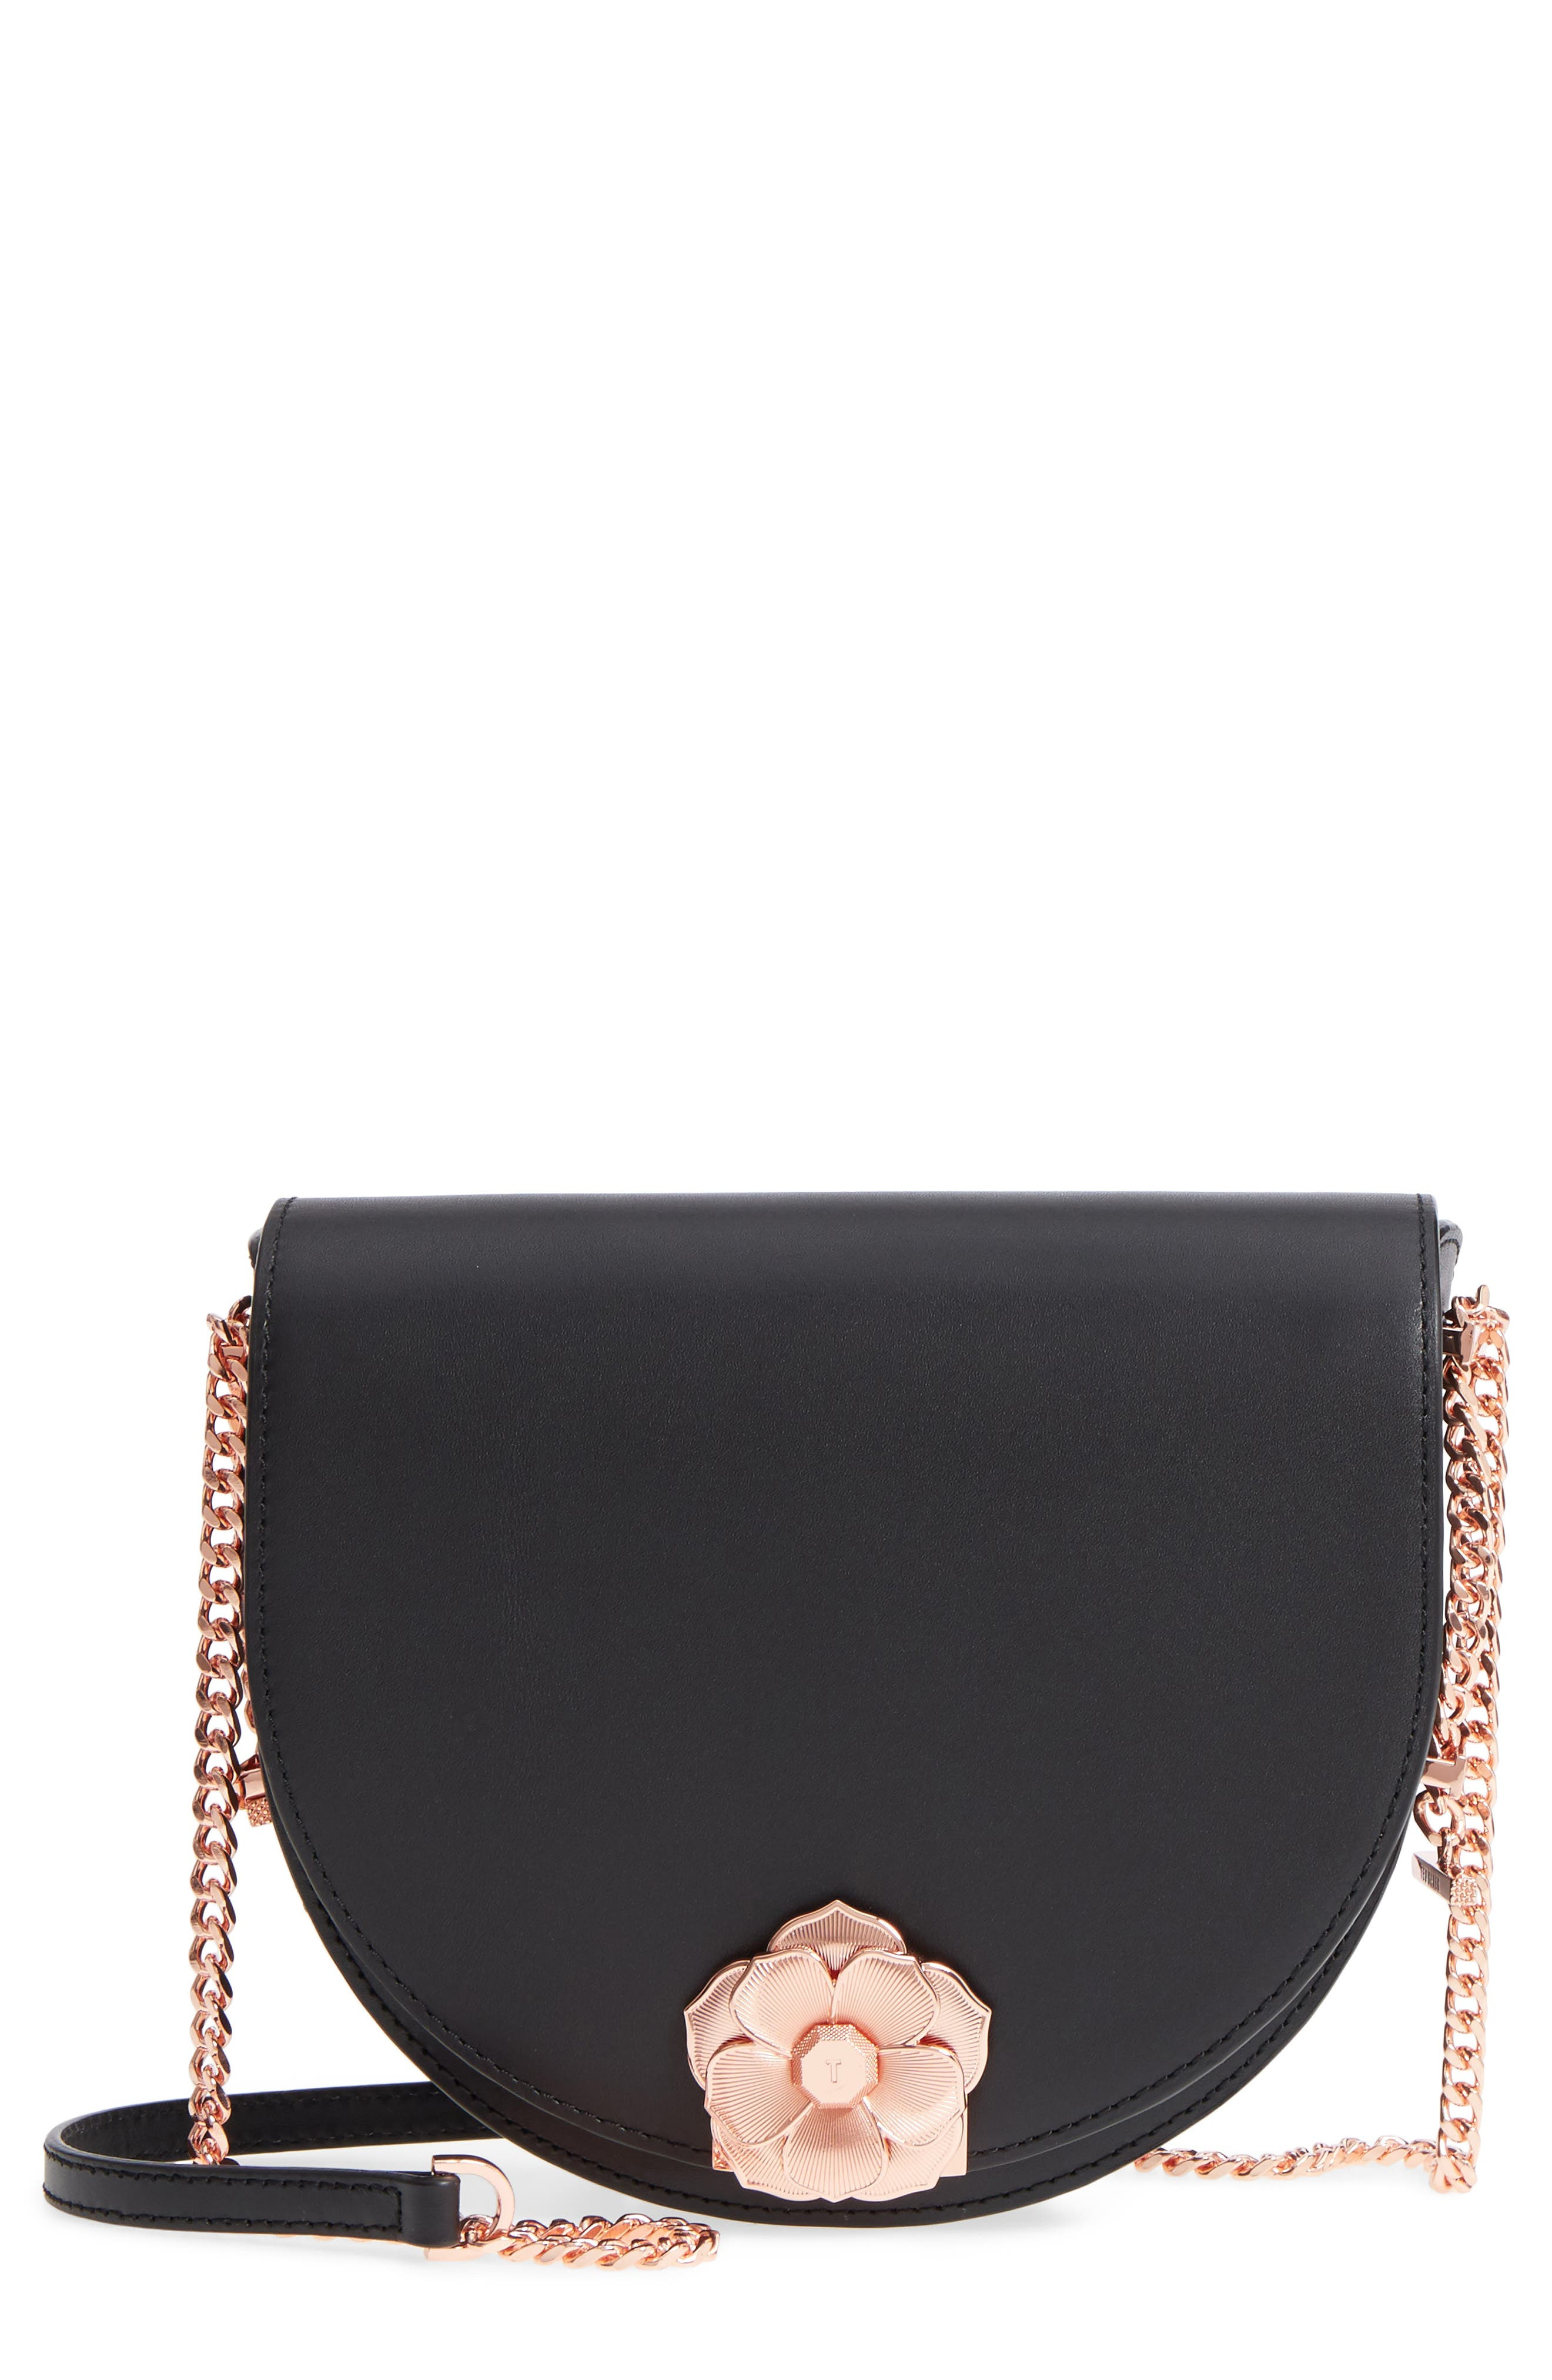 Roslyn Leather Crossbody Bag,                         Main,                         color, Black